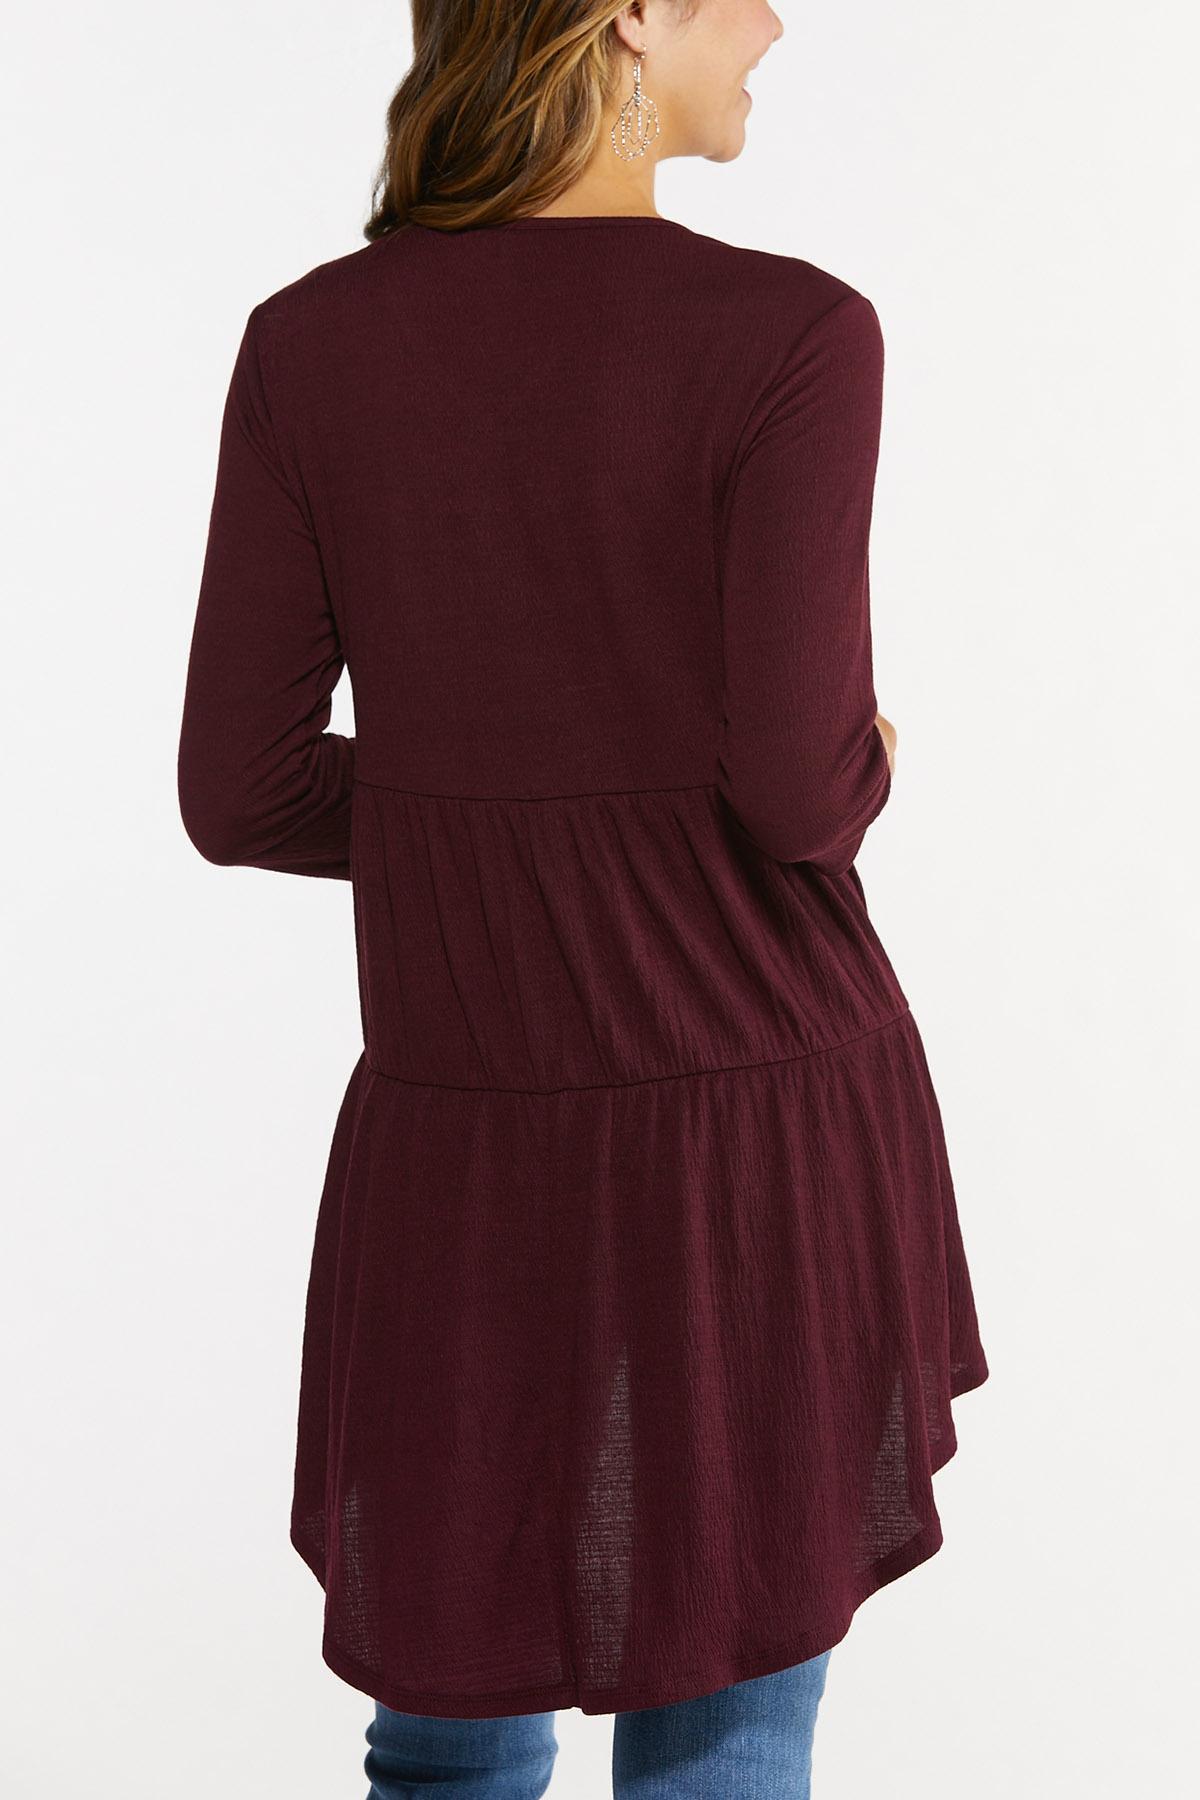 Plus Size Extreme Textured Tunic (Item #44682134)